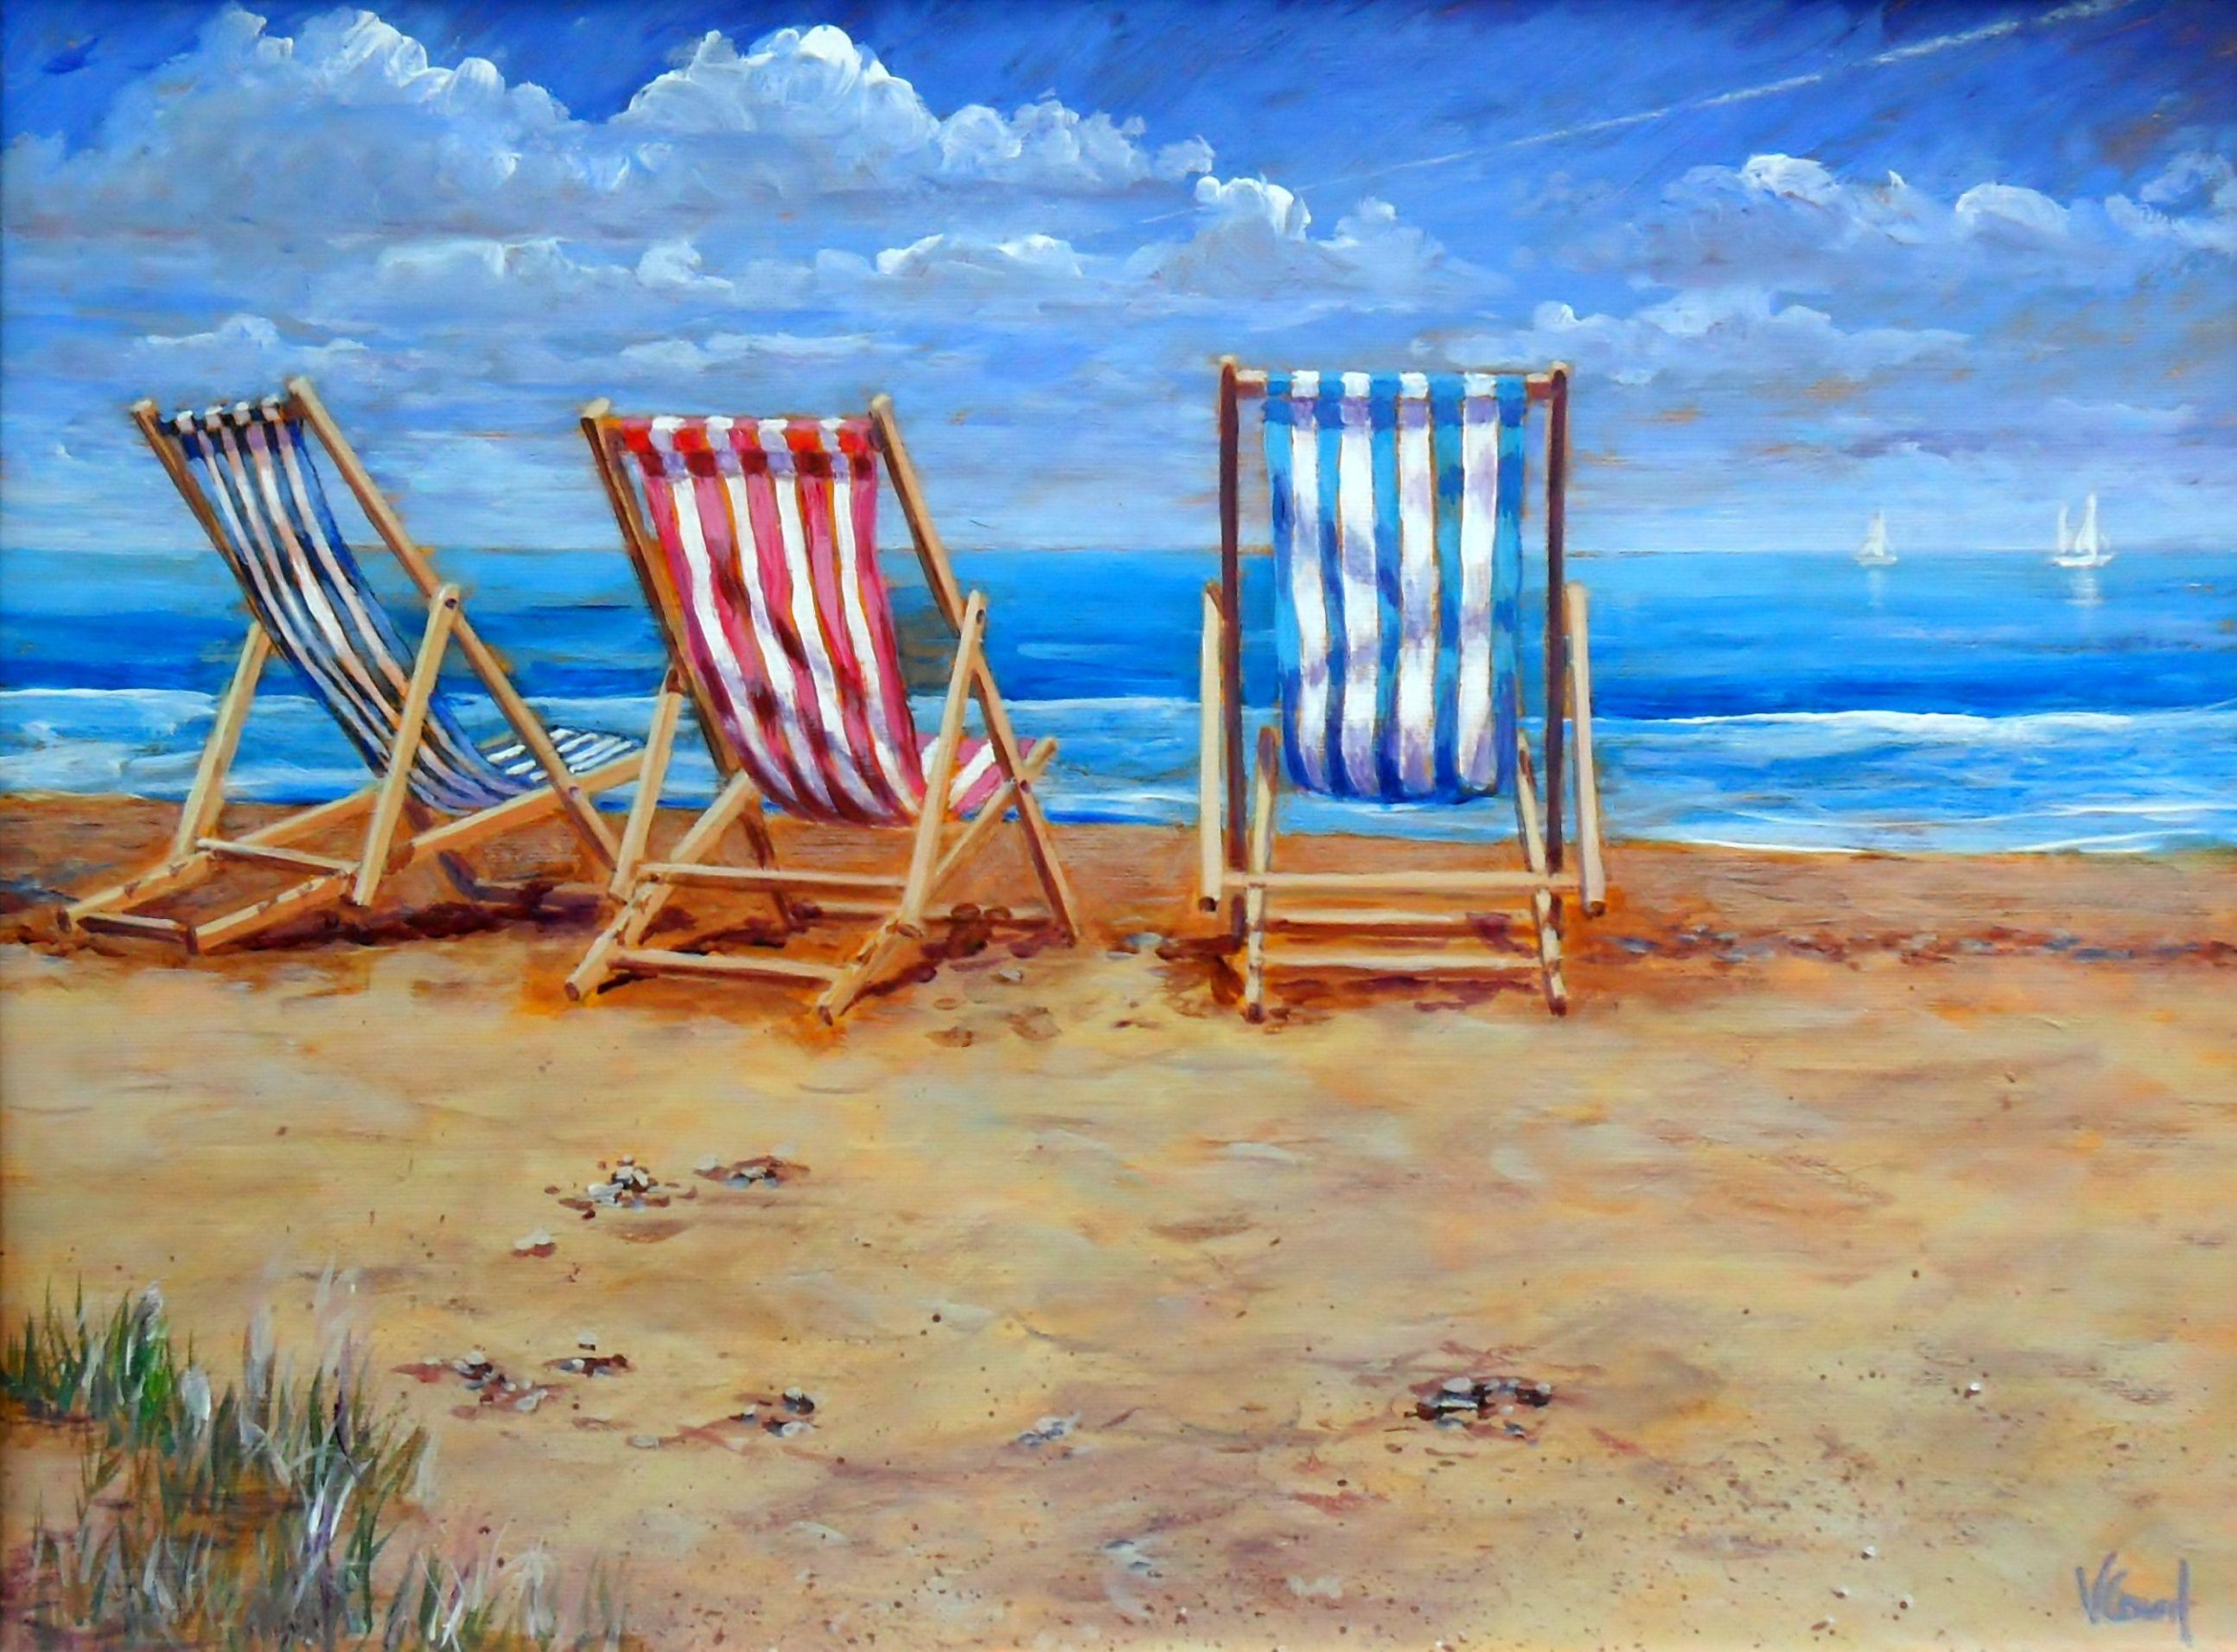 Beach chairs on the beach painting - Beach Art